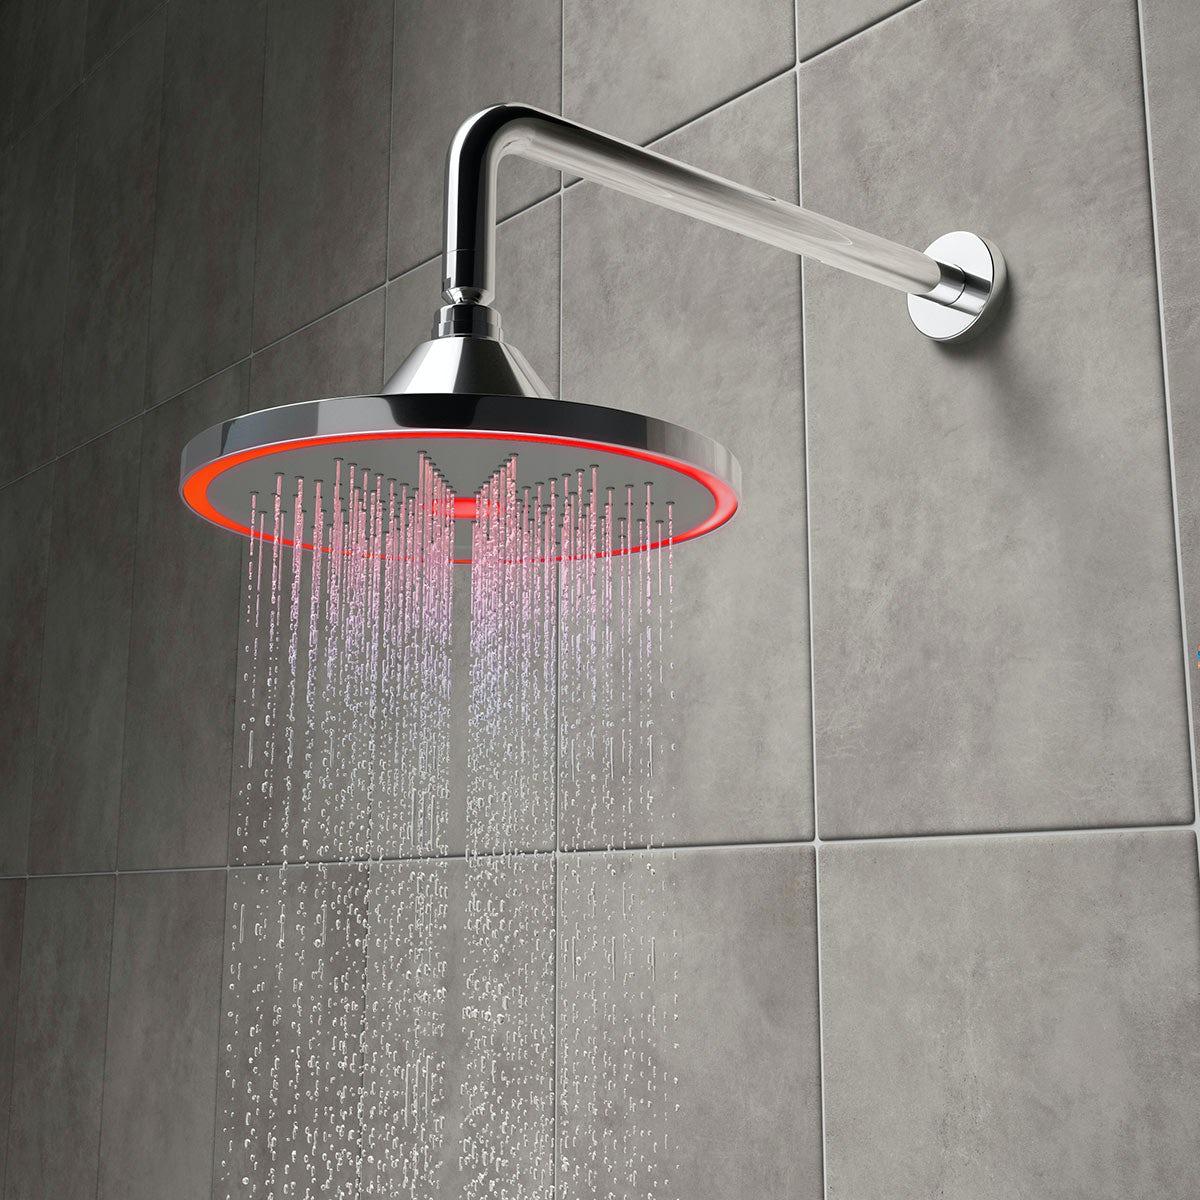 Mode Hydro Temperature LED Shower Head 235mm | VictoriaPlum.com